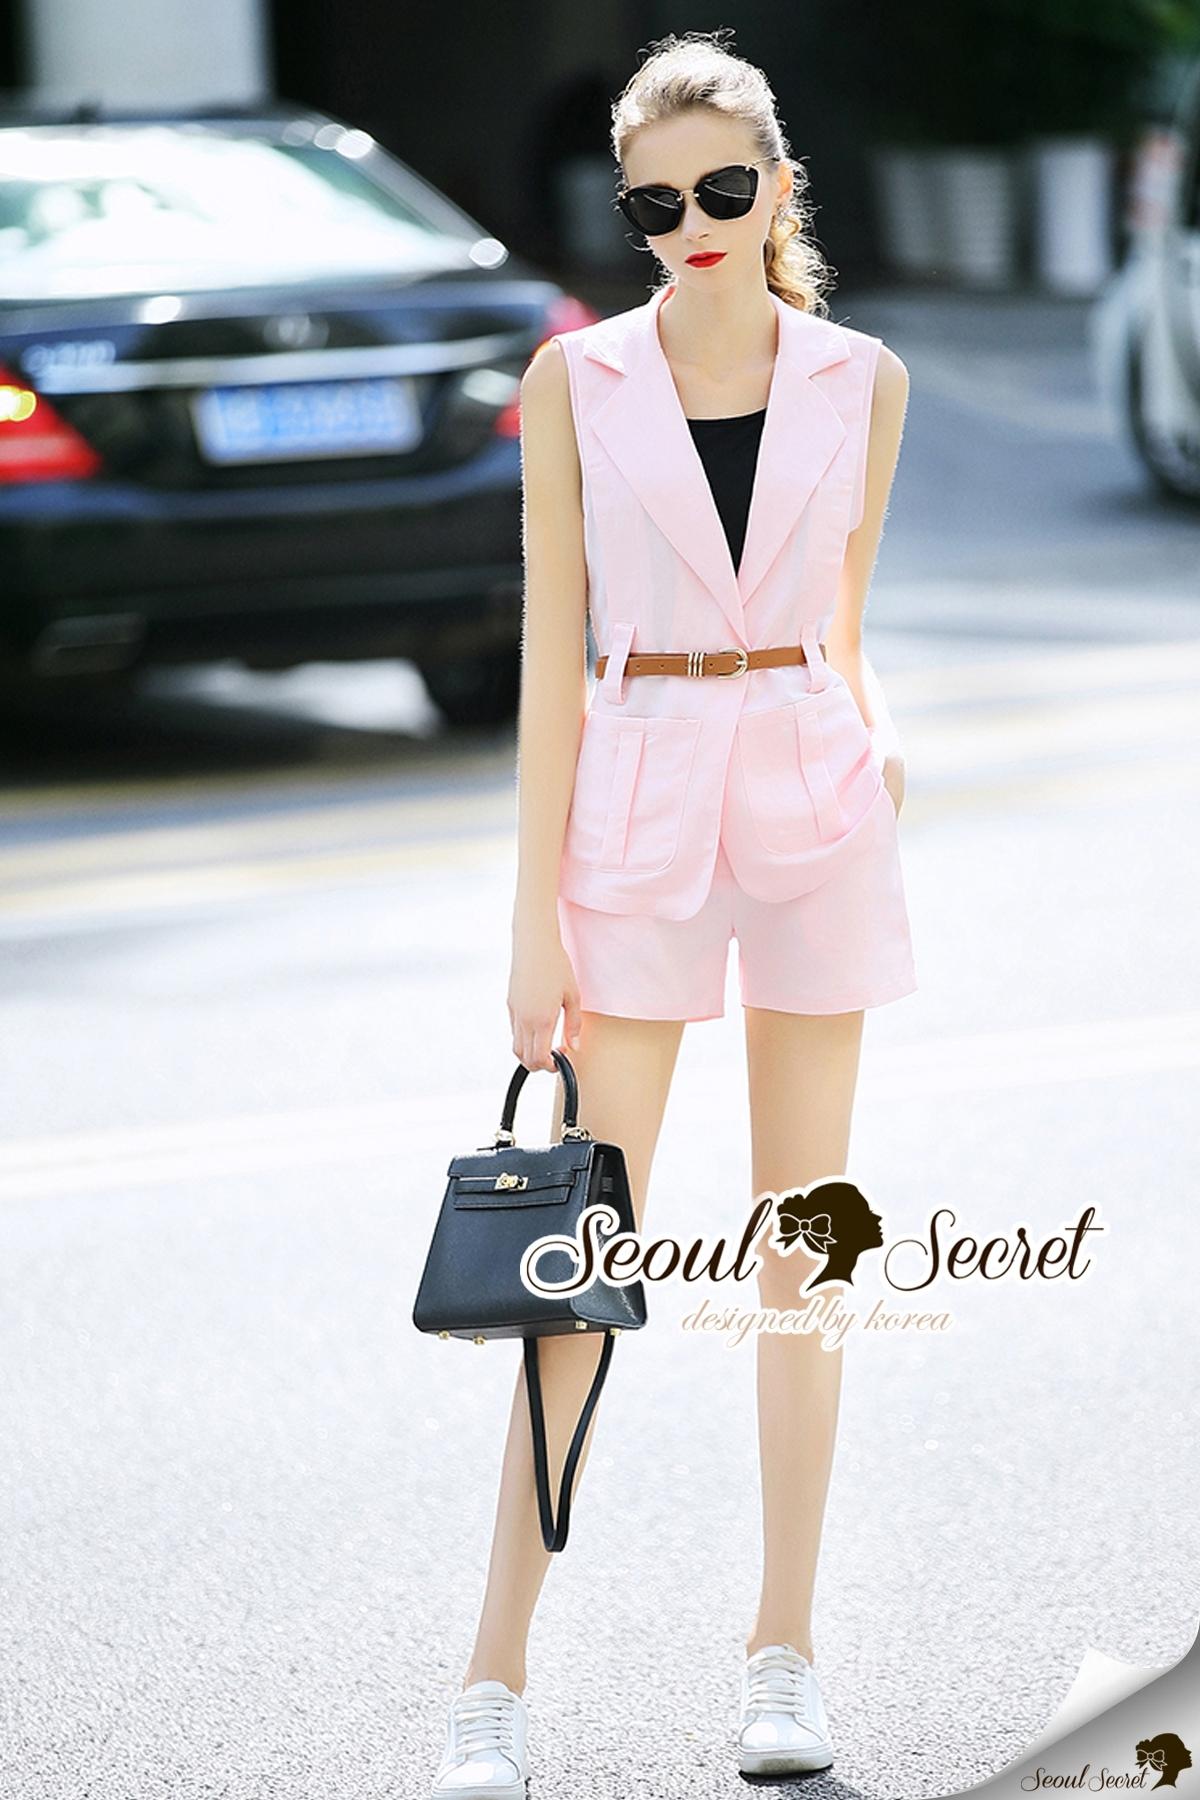 Seoul Secret Say's... Smarty Pinky V Cami Suite Set